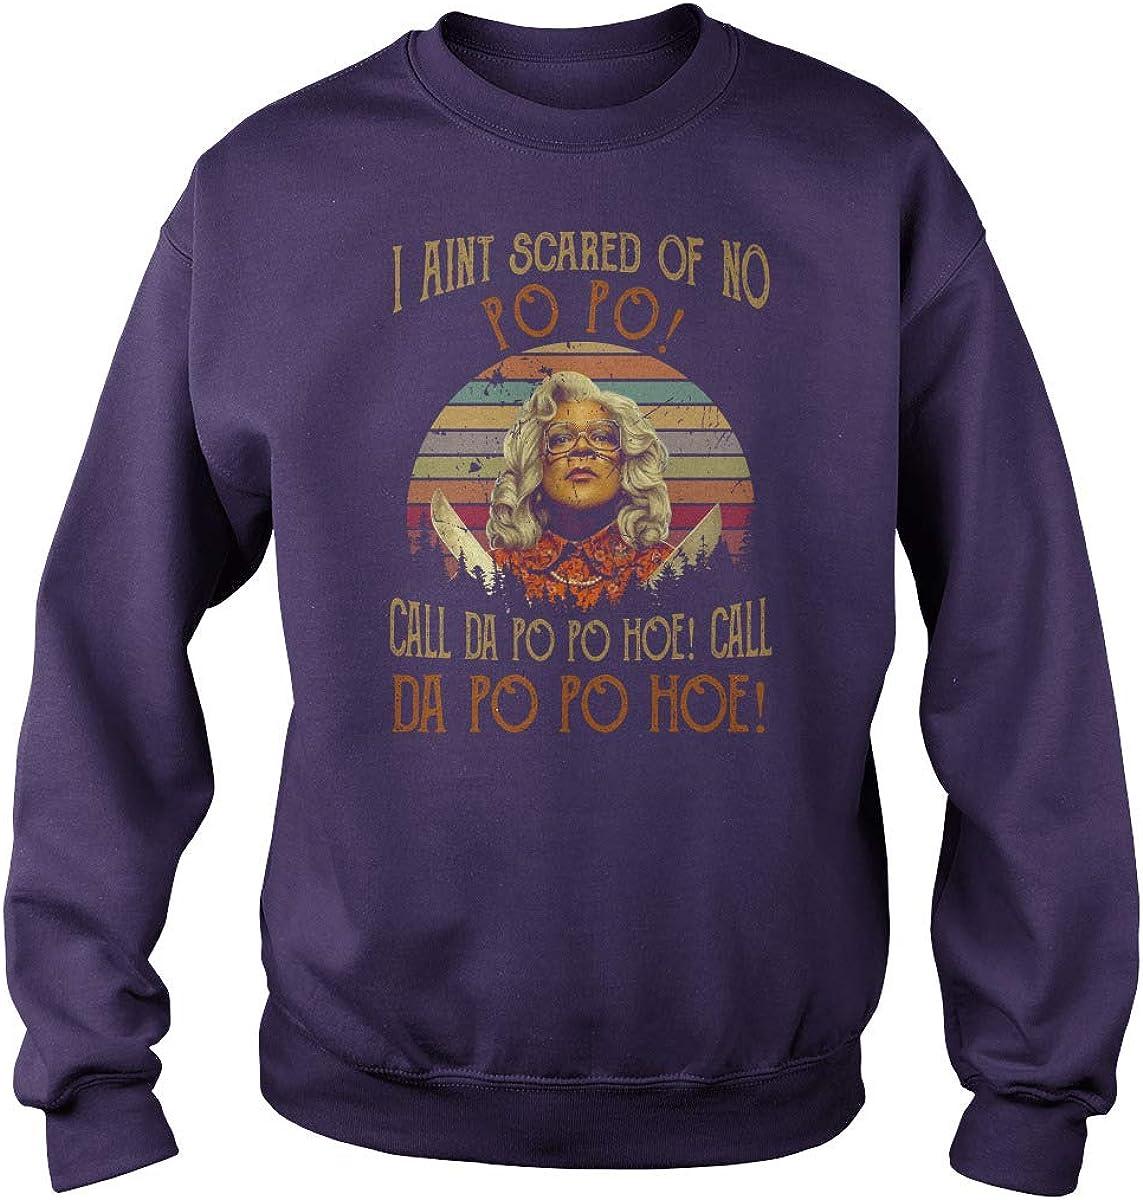 Madea I Ain't Scared of ご注文で当日配送 No Hoe オープニング 大放出セール Da Call T-Shirt Pop Po